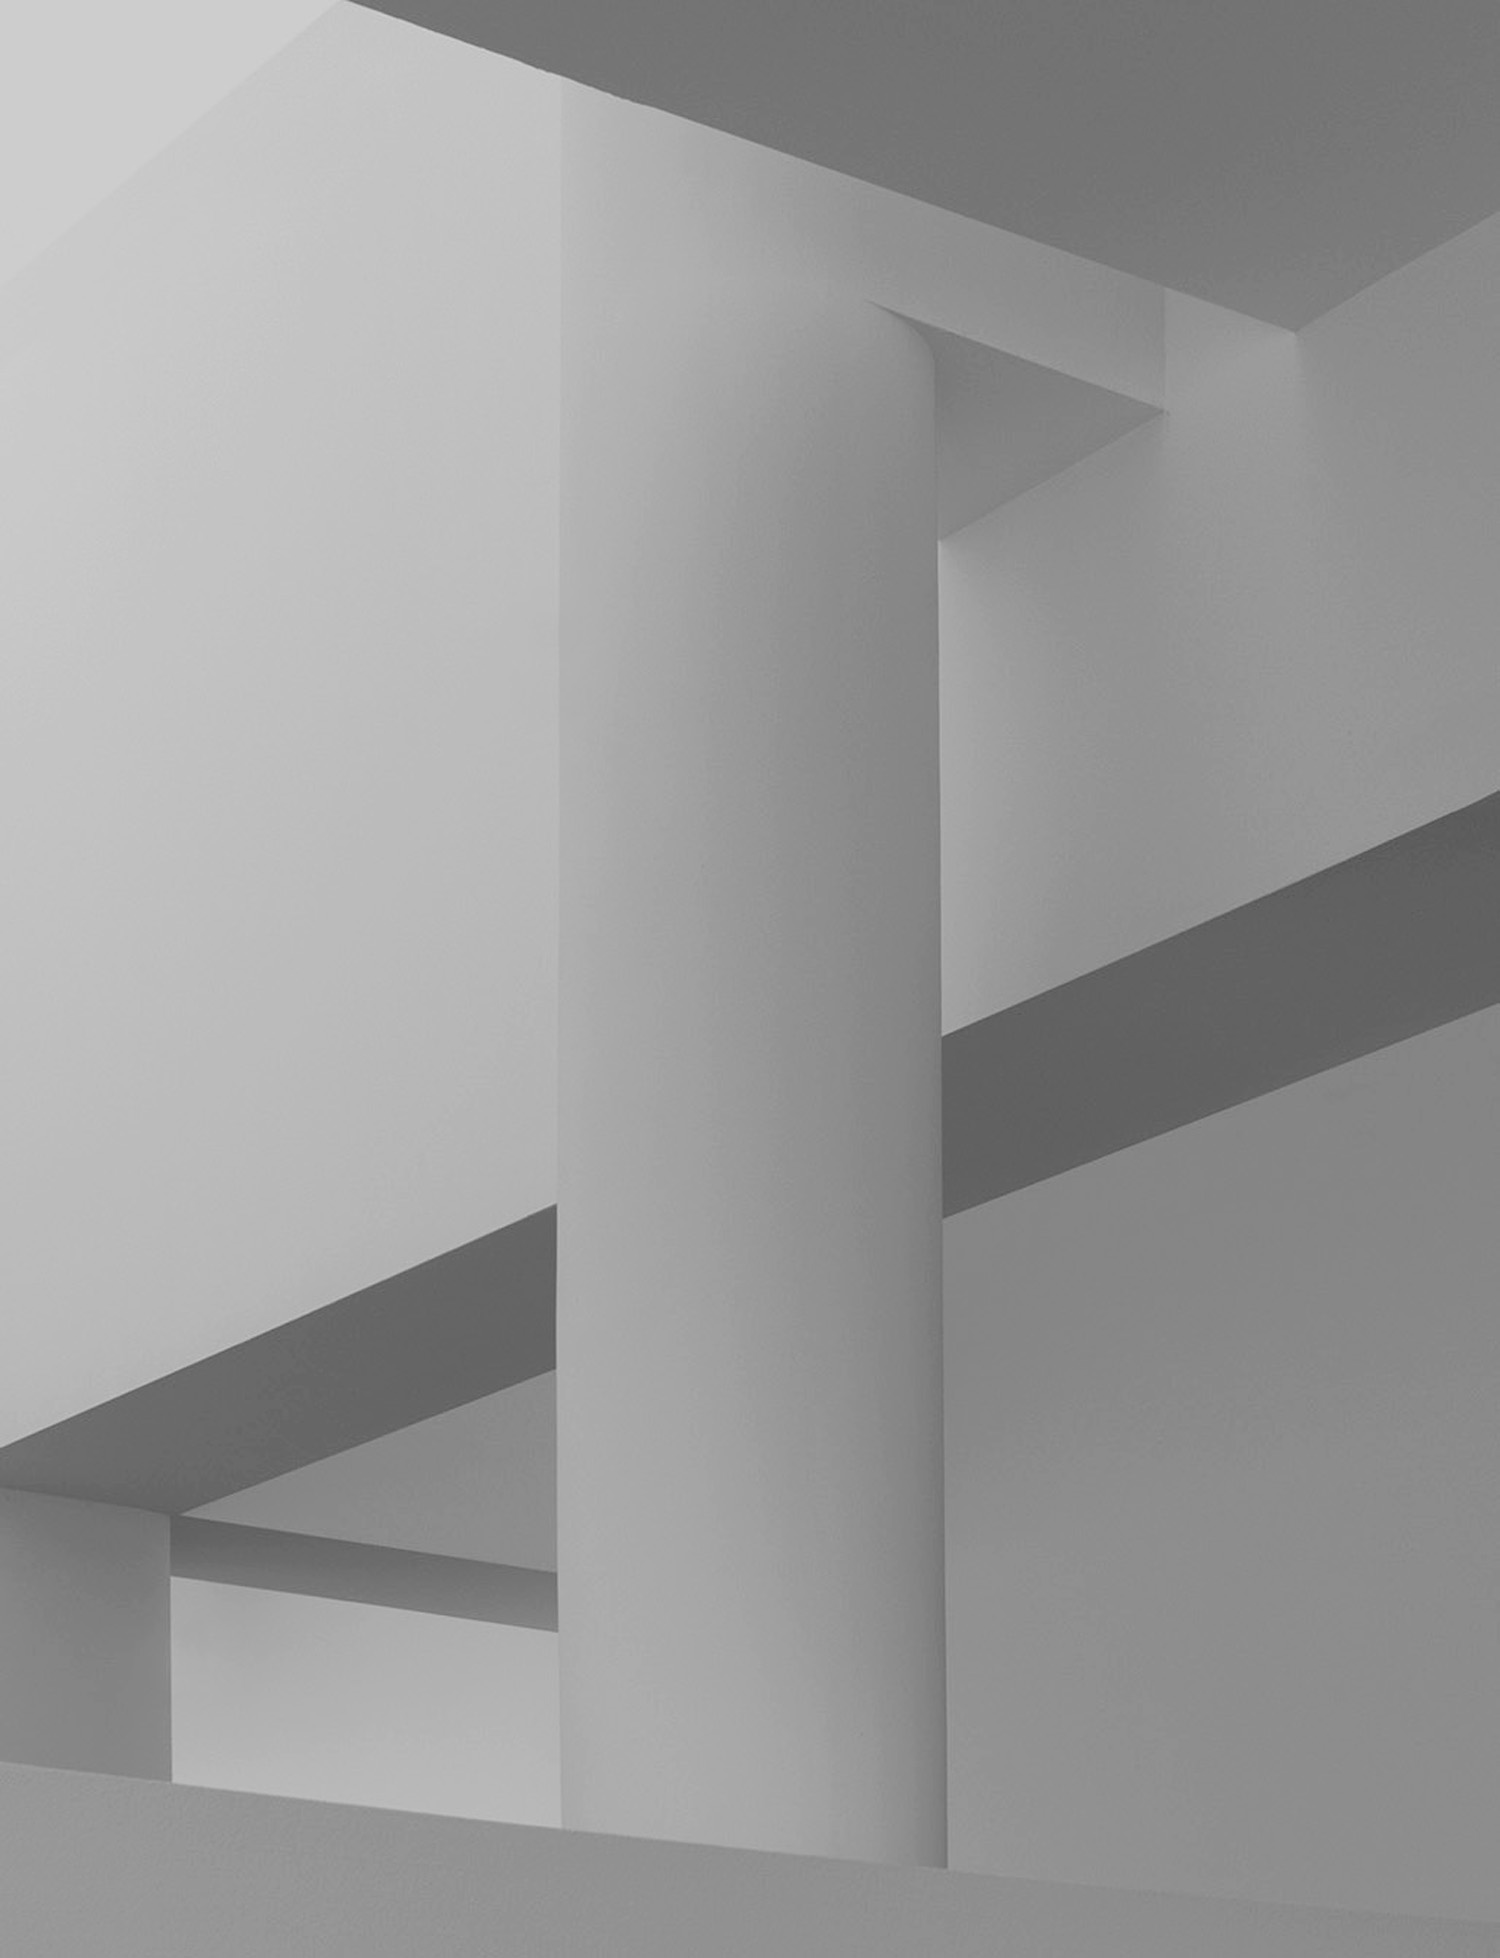 Emily-Grundon_architecture_spaces_0028.jpg